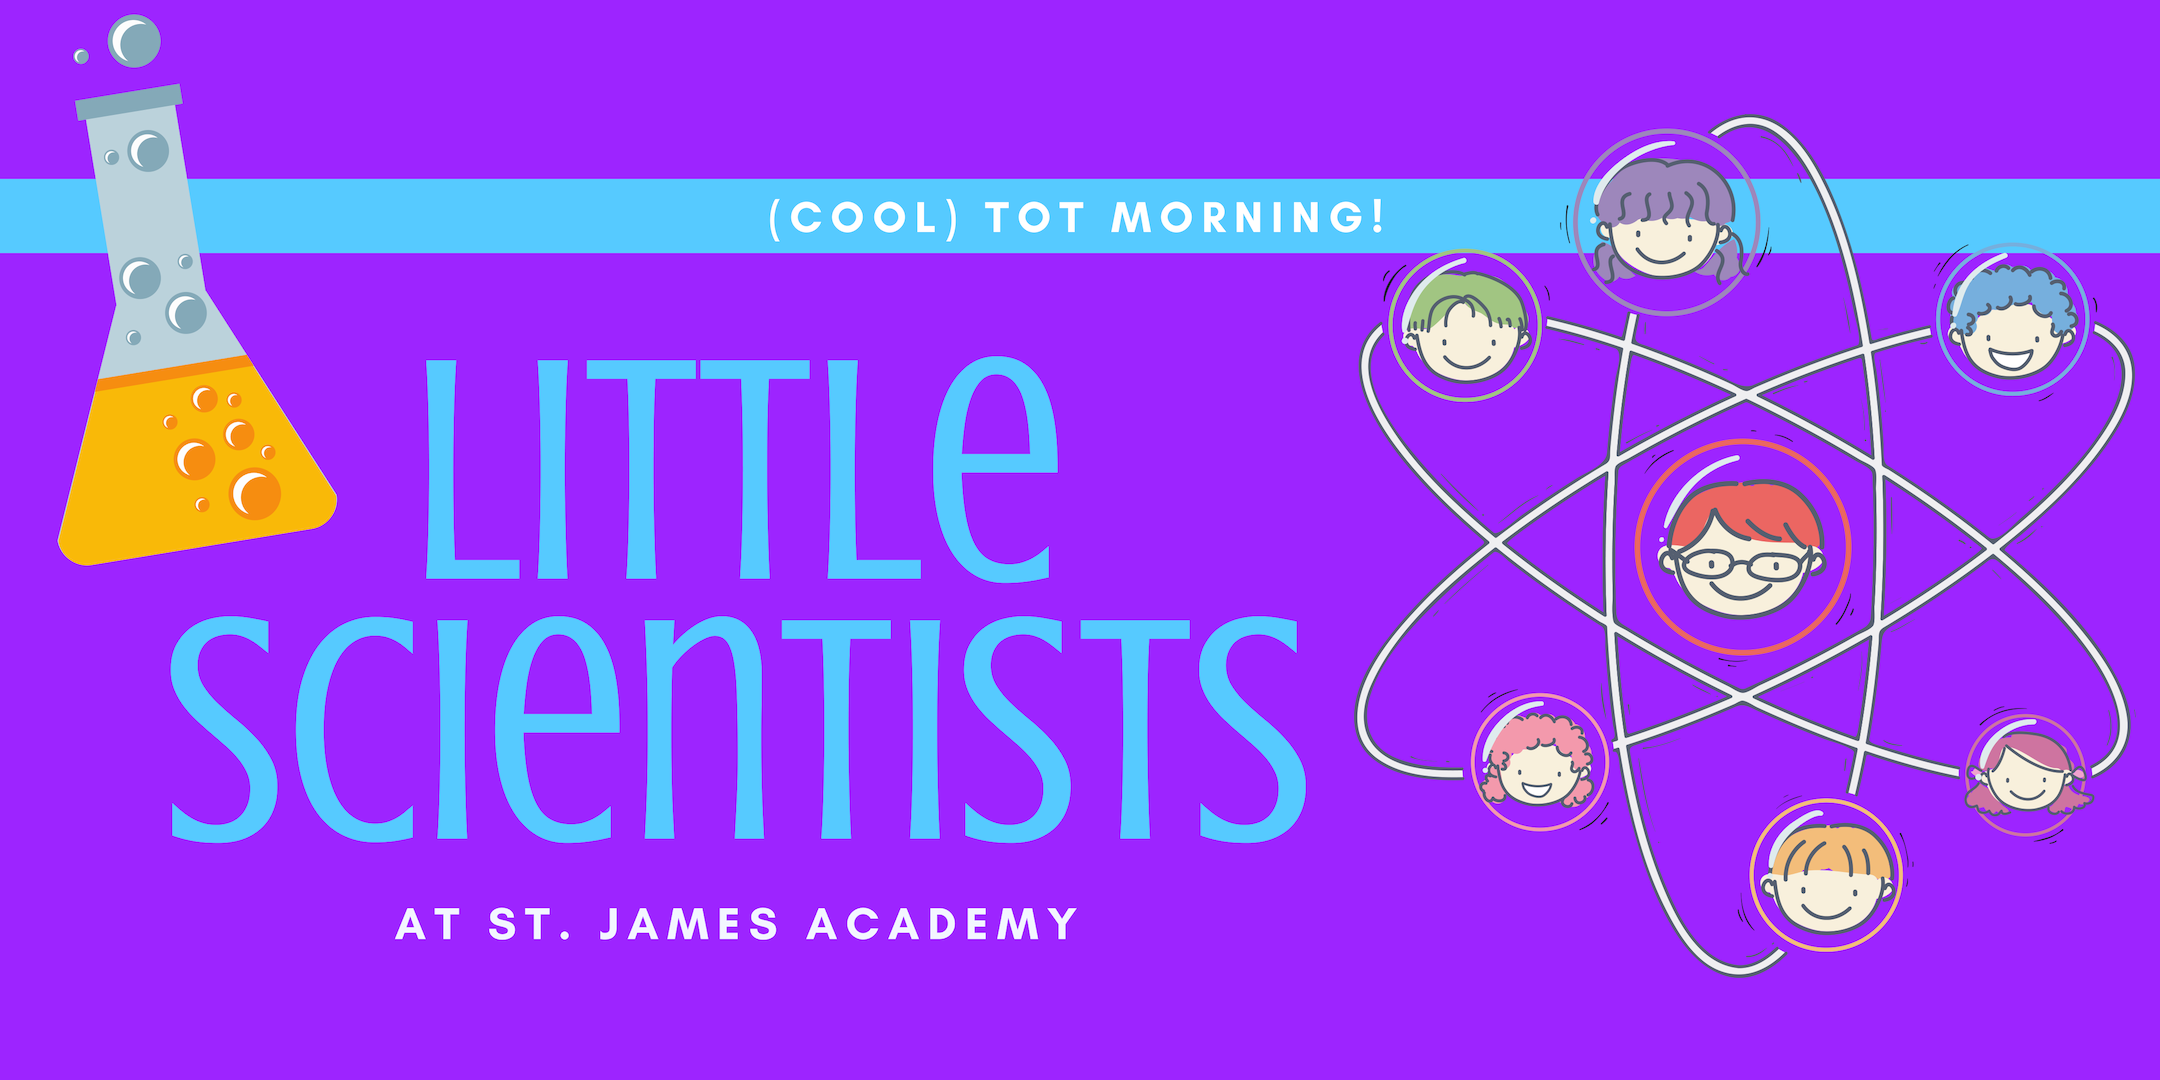 Cool Tots: Little Scientists